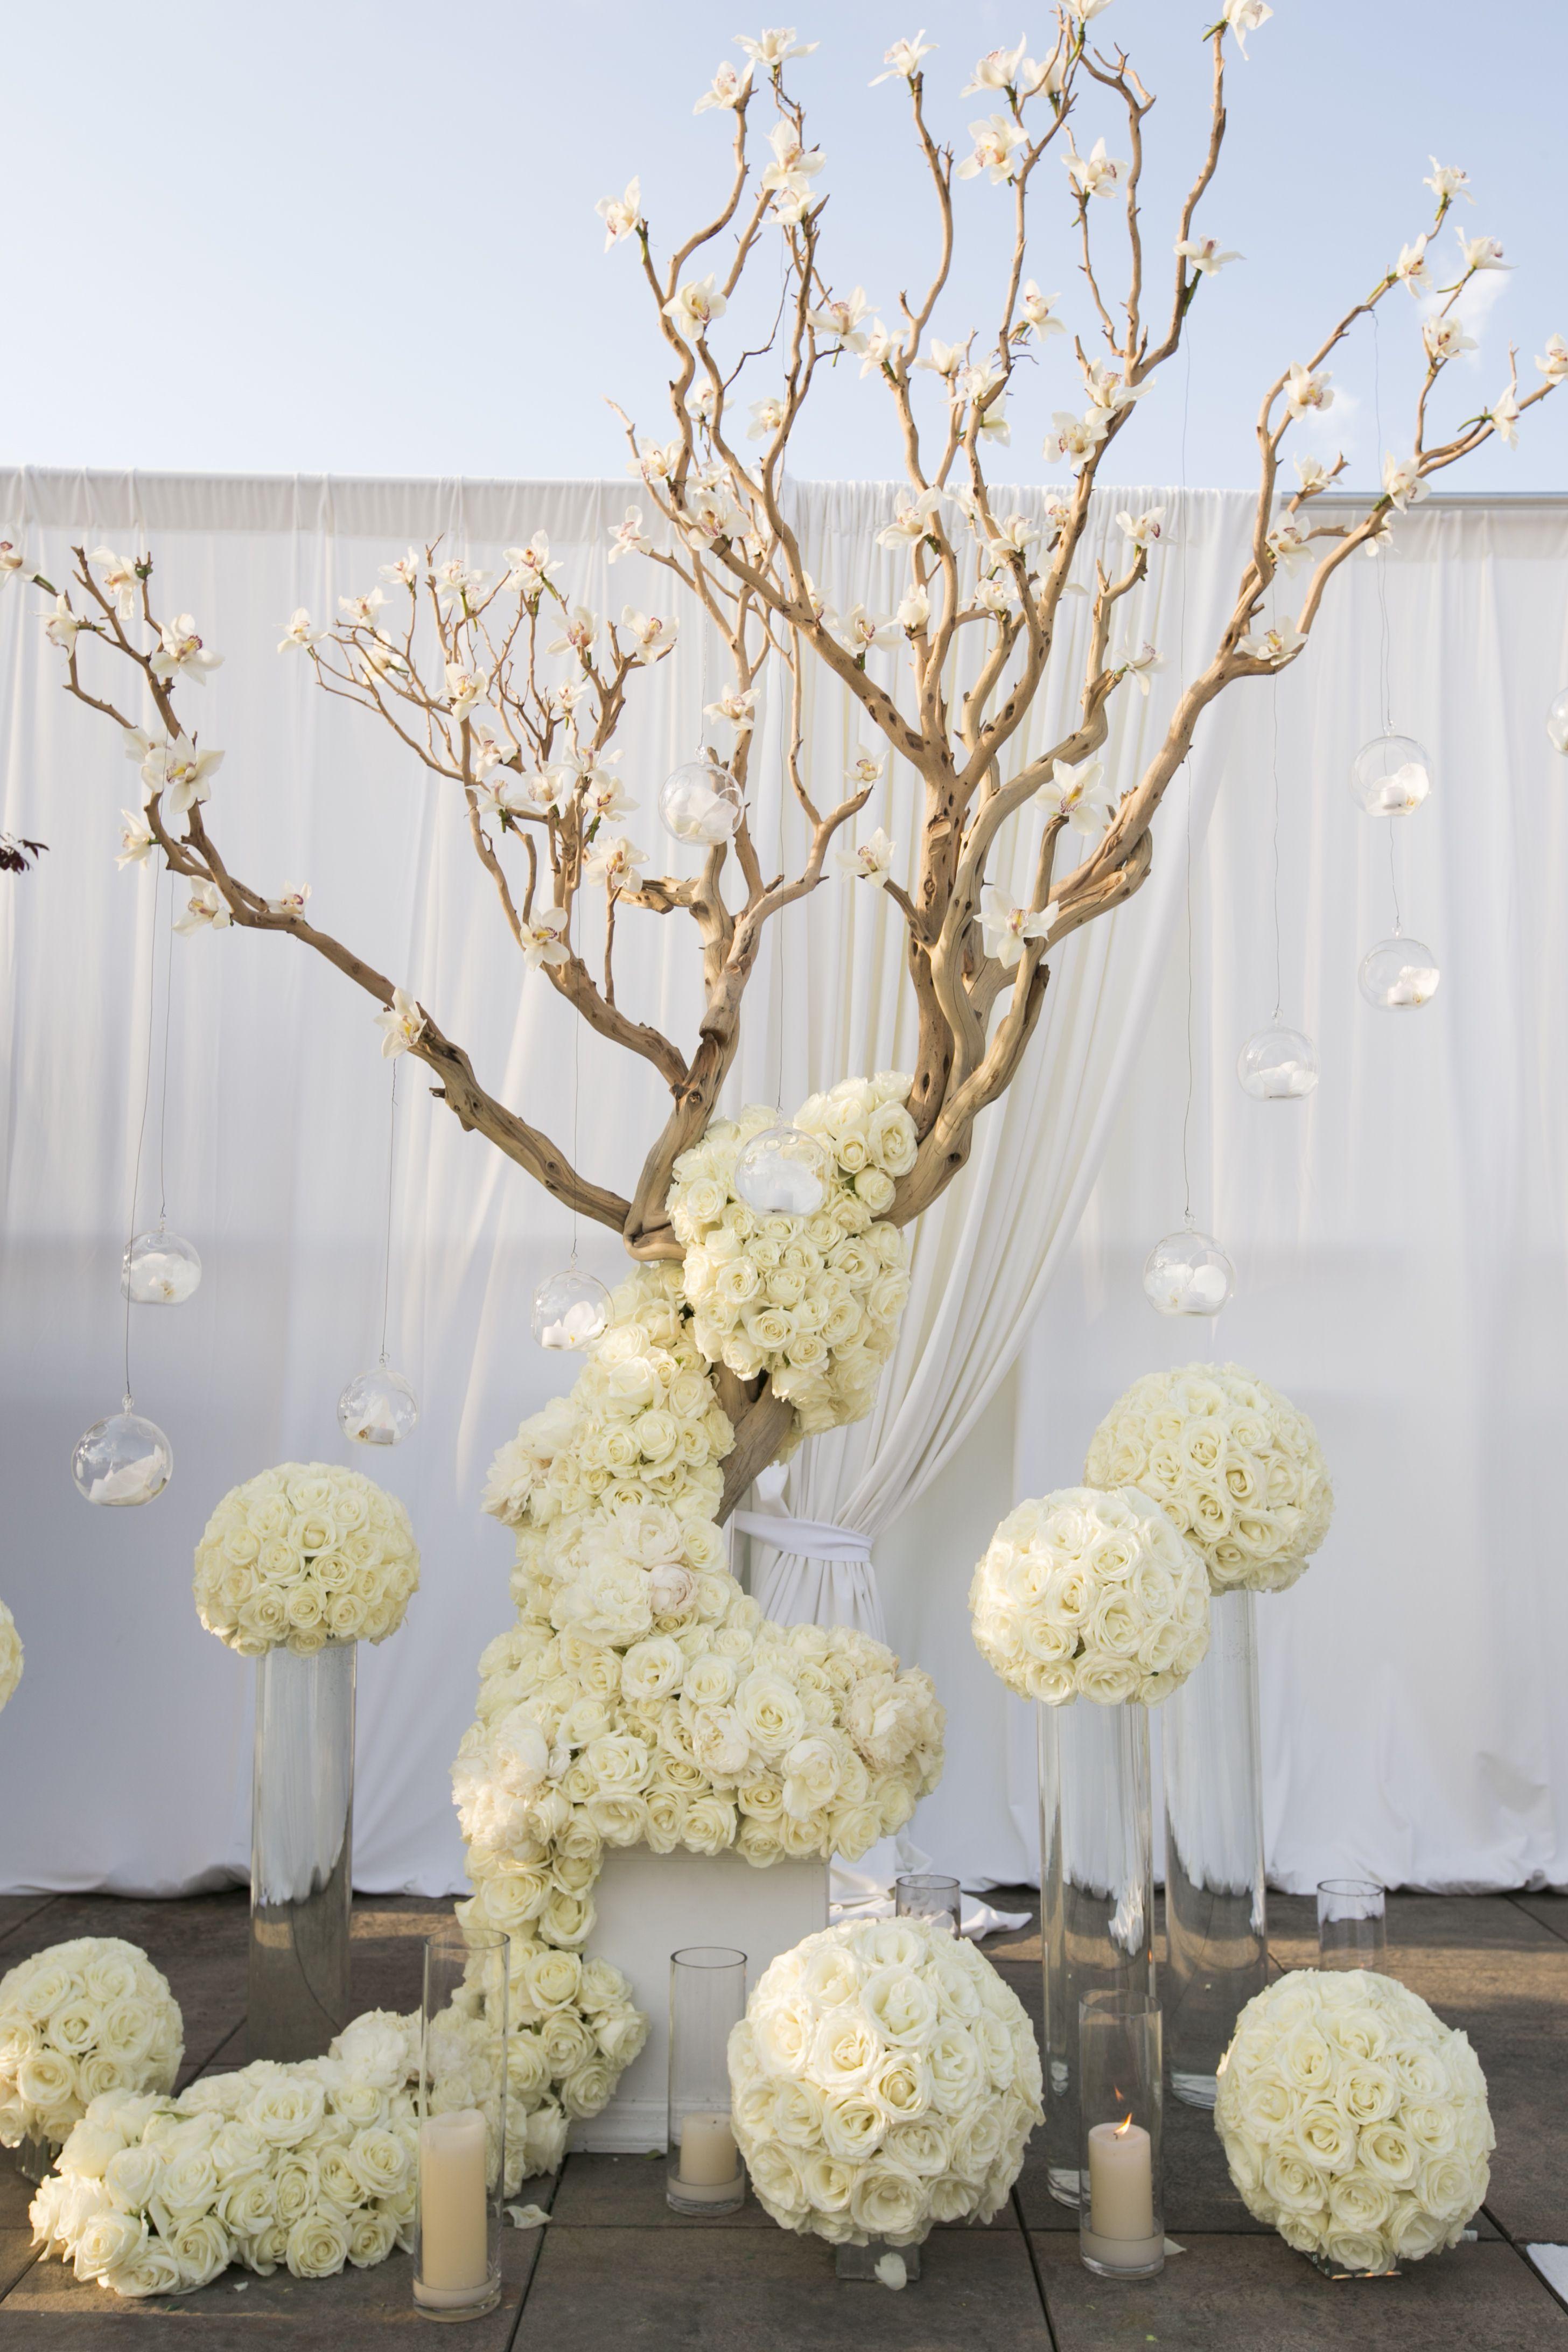 178.jpg (2912×4368) | Wedding | Pinterest | Wedding, Weddings and ...